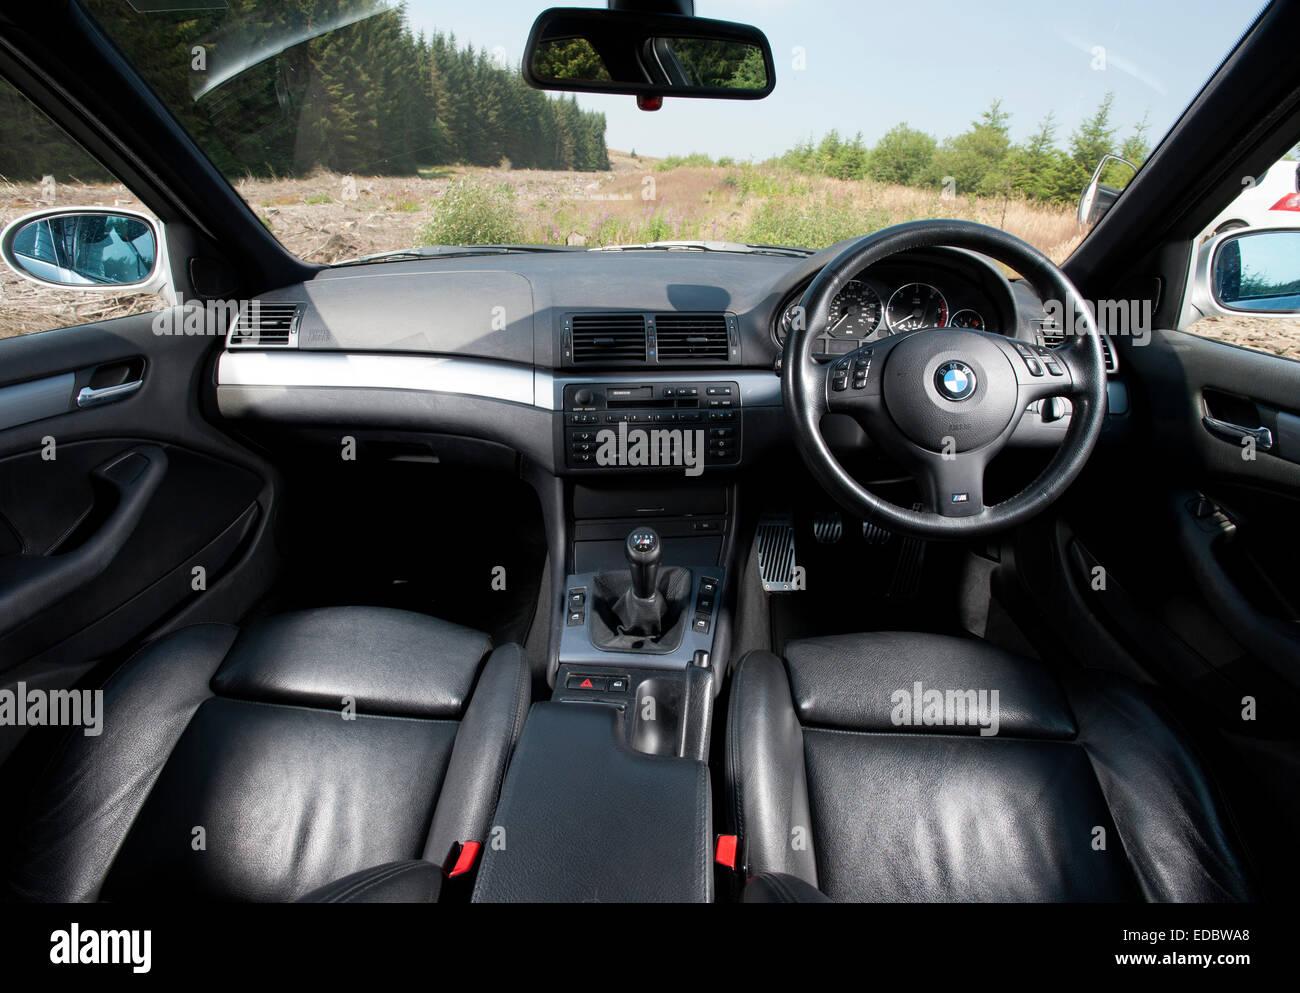 E D BMW Series Interior Stock Photo Royalty Free - Bmw 3 series interior